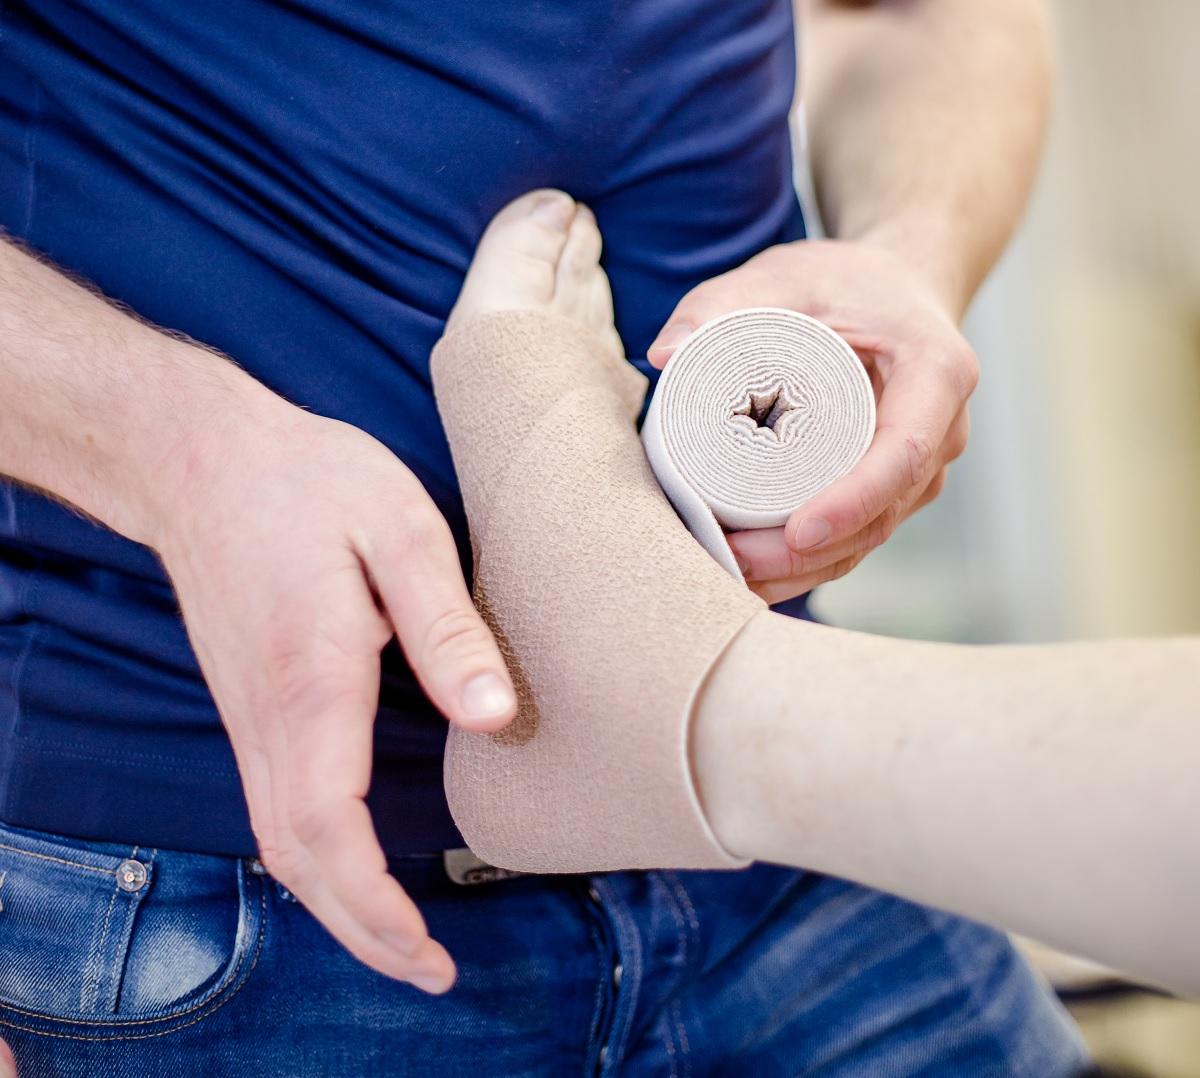 oedeem fysiotherapie